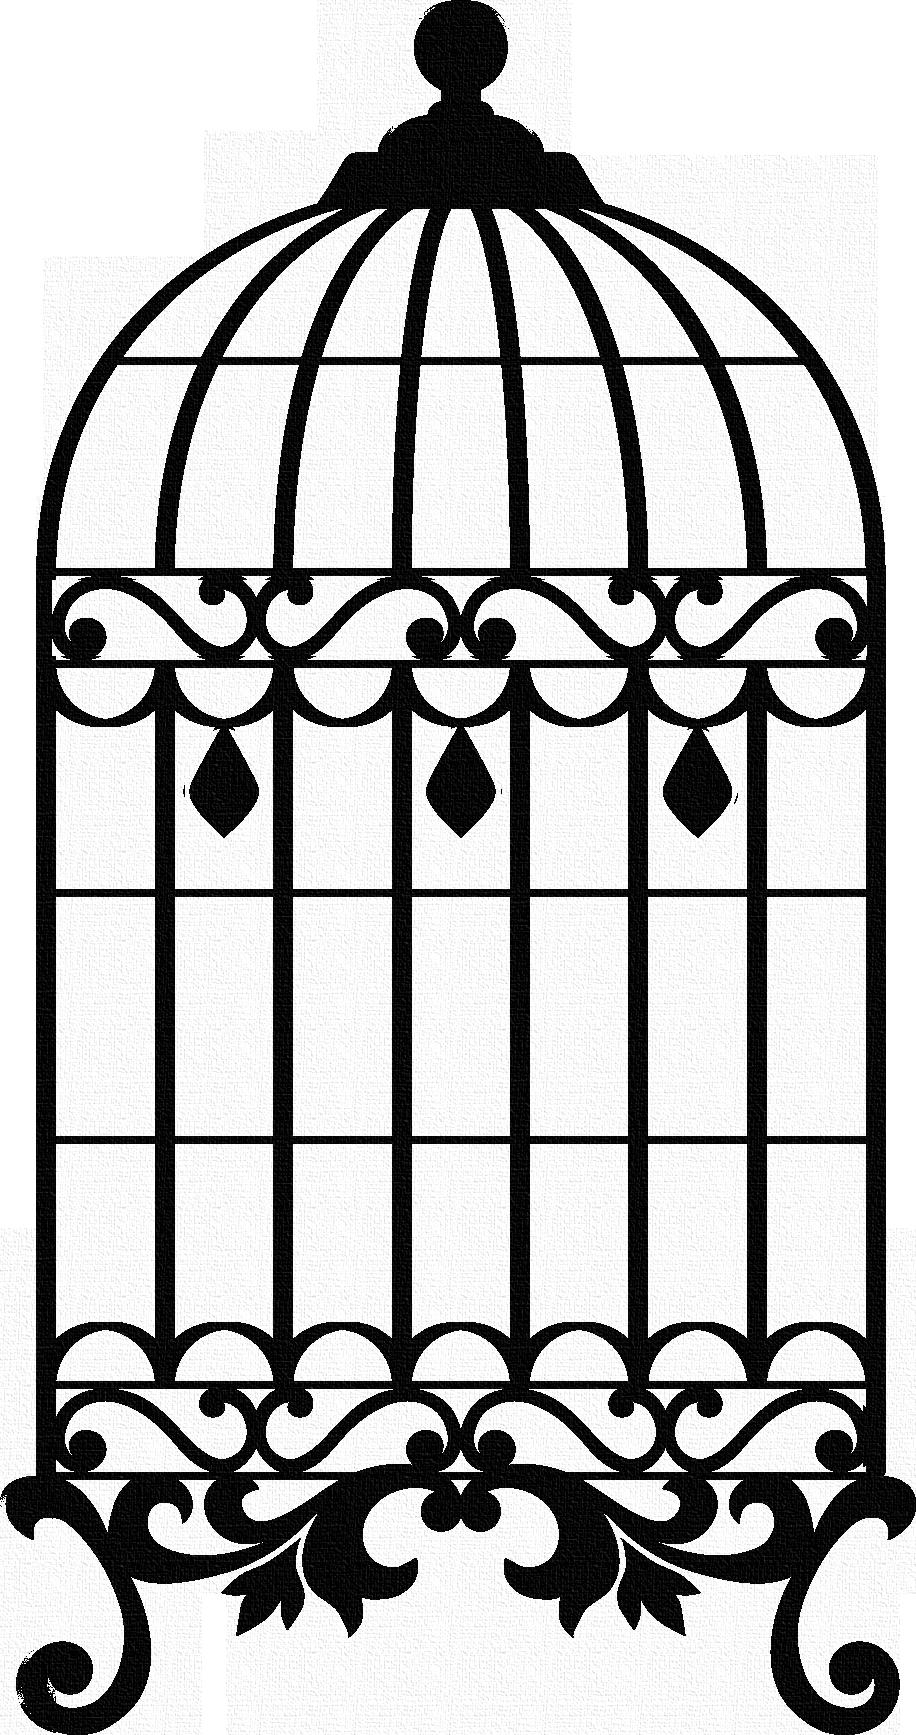 916x1735 Pin By Annick Honnert On Papier Silhouette